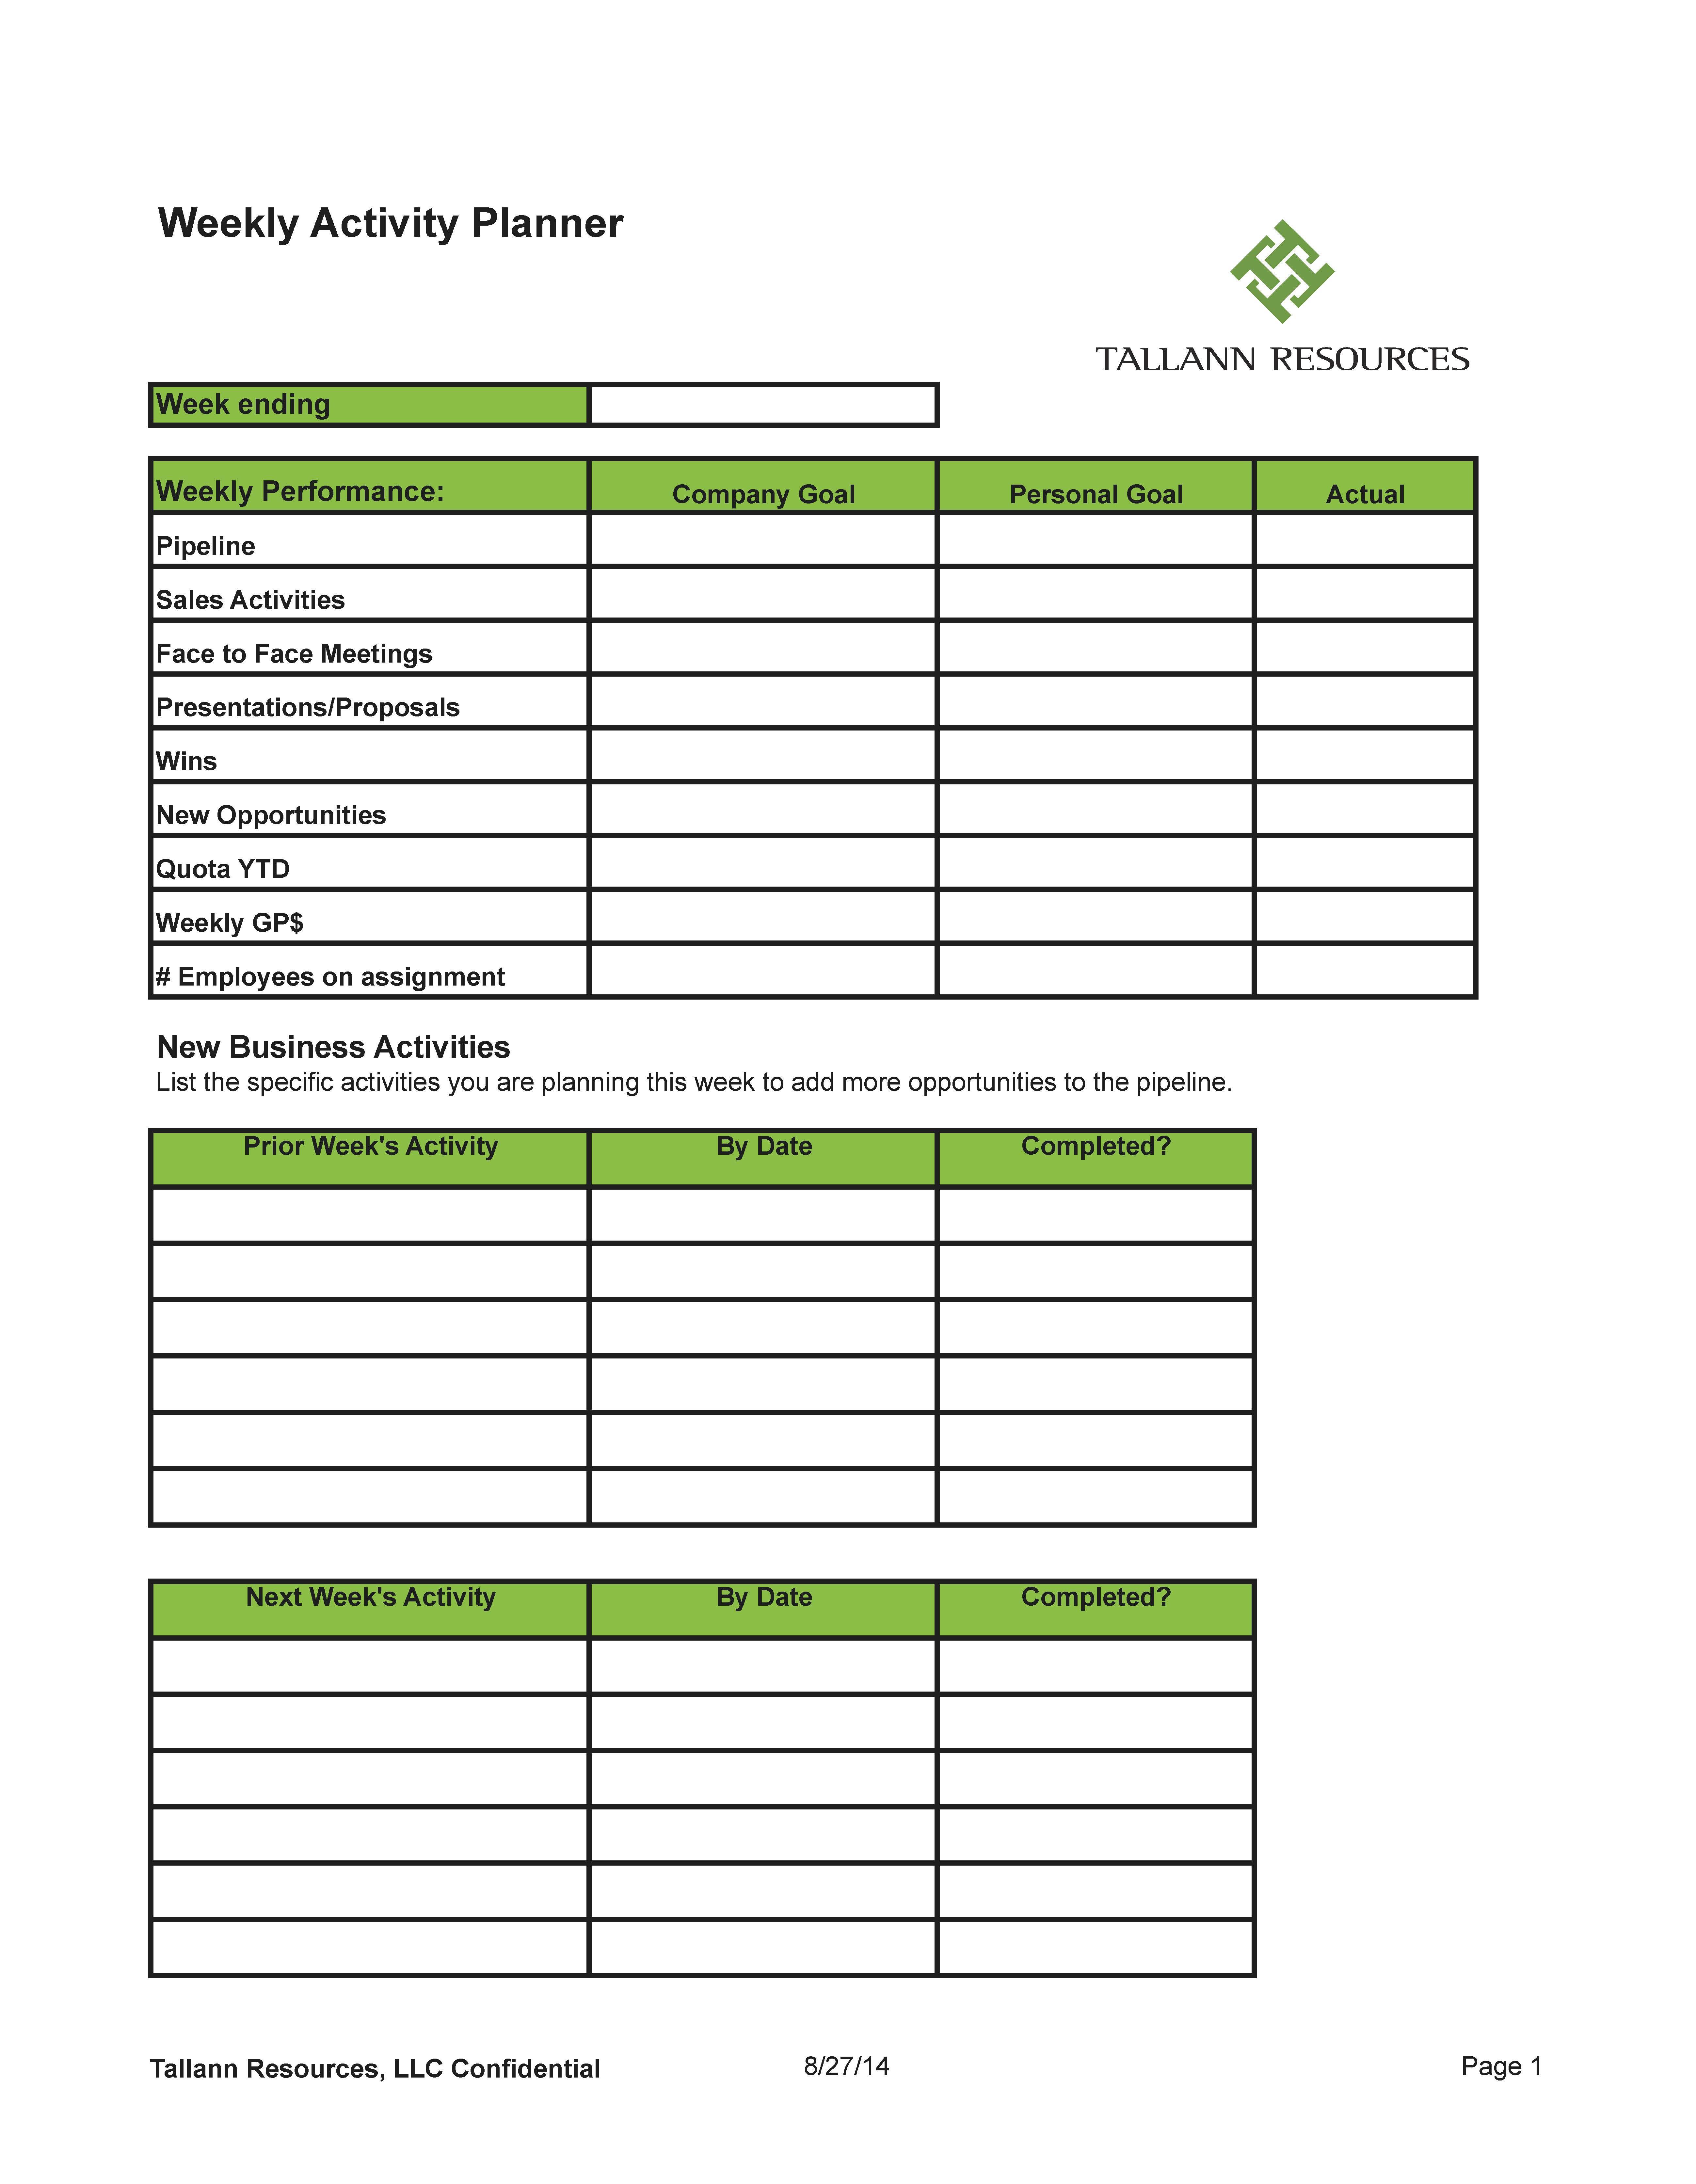 Tallann Resources Weekly Sales Activity Planner